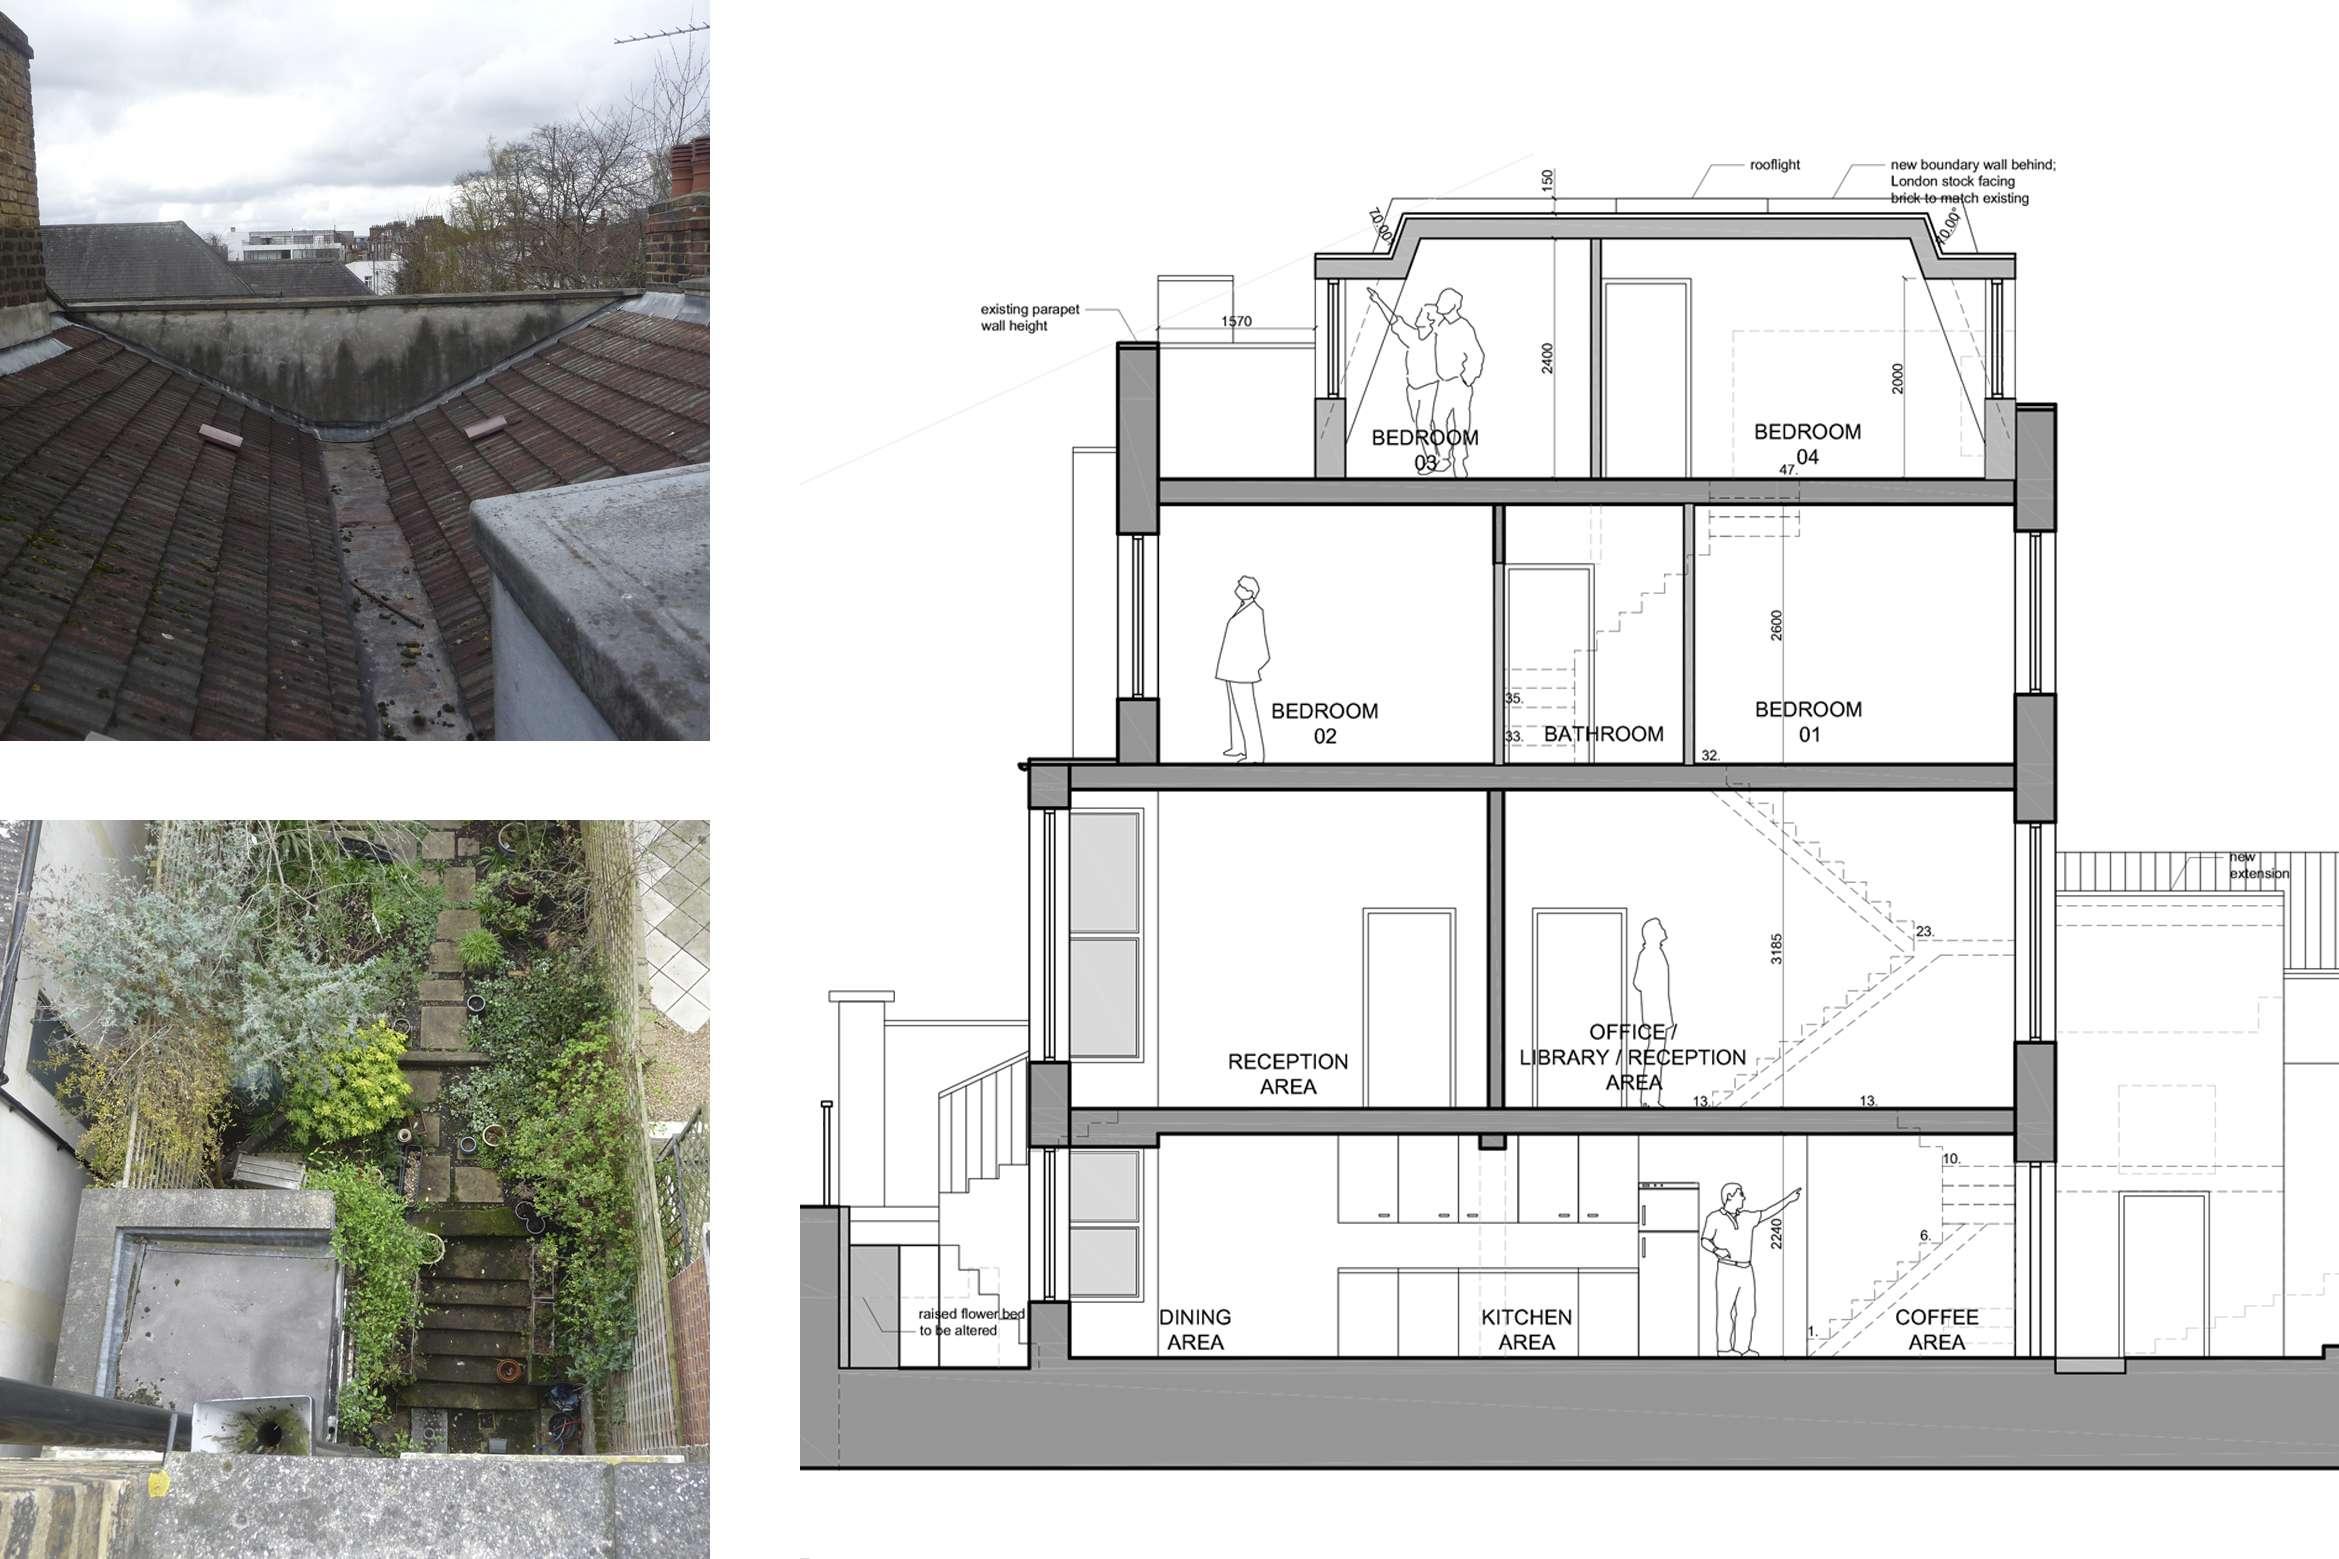 Architect designed mansard roof extension Finsbury Park Islington N7 Section 1 Finsbury Park, Islington N7 | Mansard roof extension